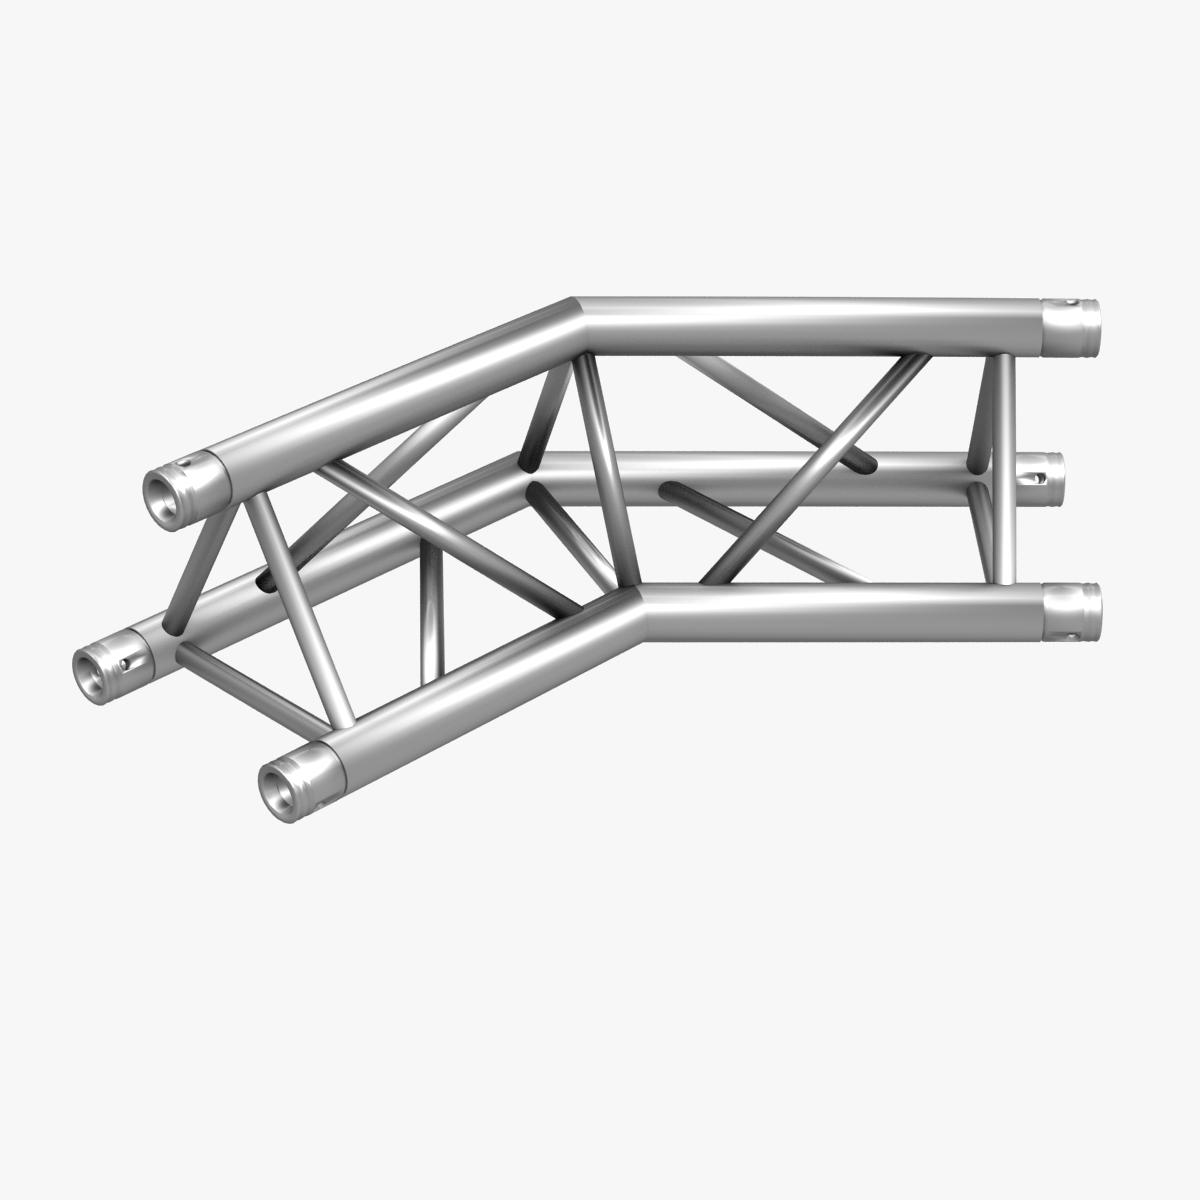 triangular trusses (collection 55 modular pieces) 3d model 3ds max dxf fbx c4d dae texture obj 216235